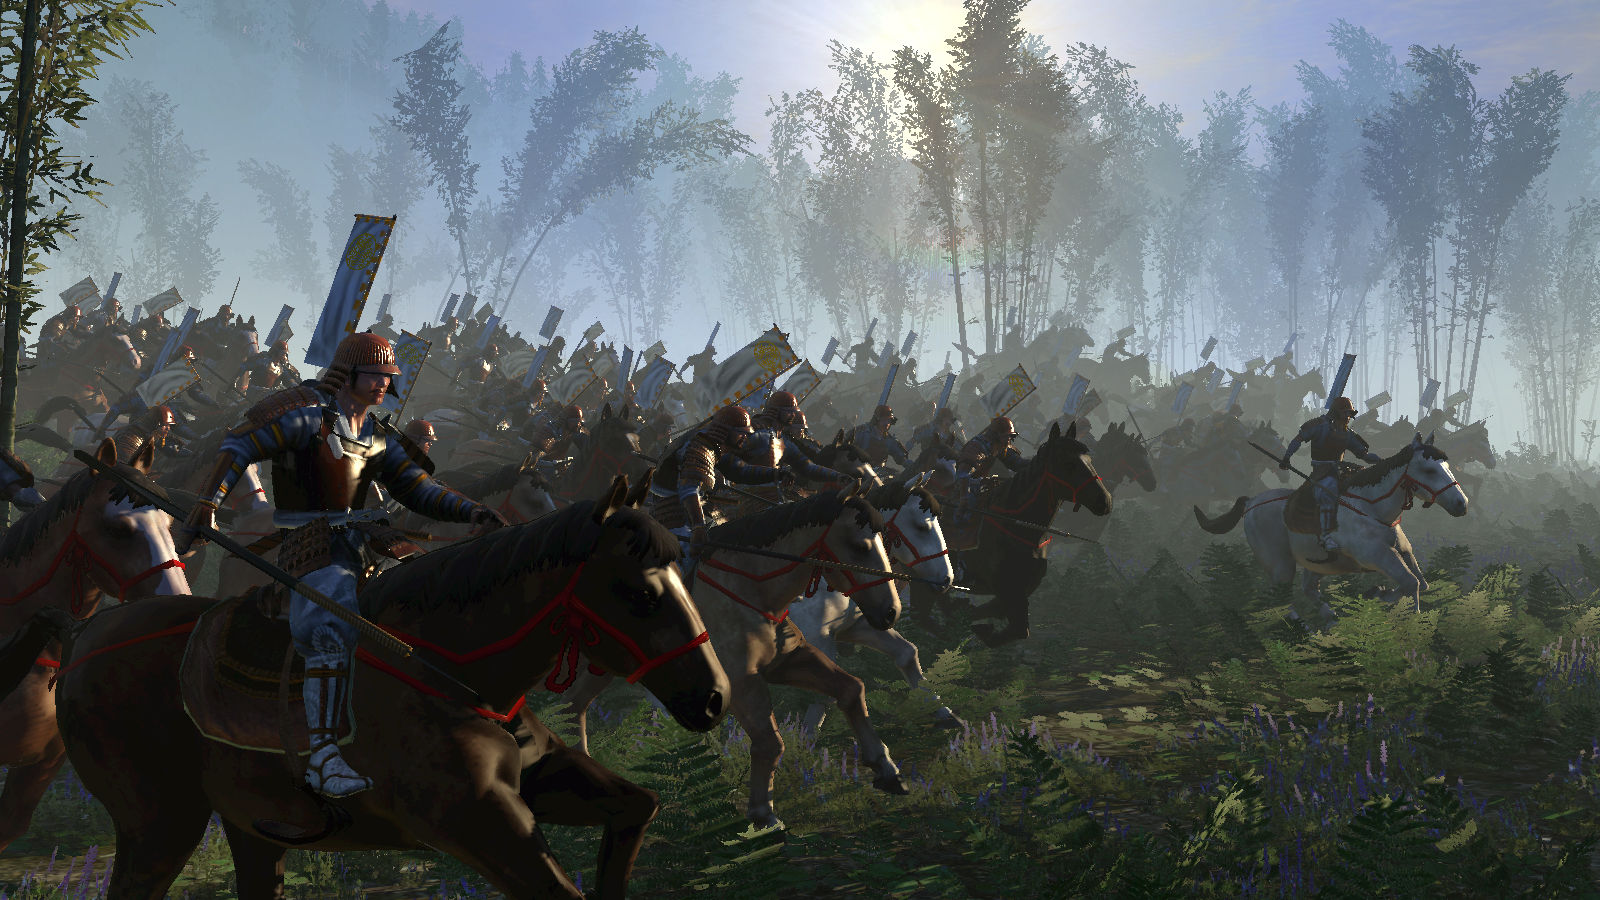 shogun 2 total war download bittorrent